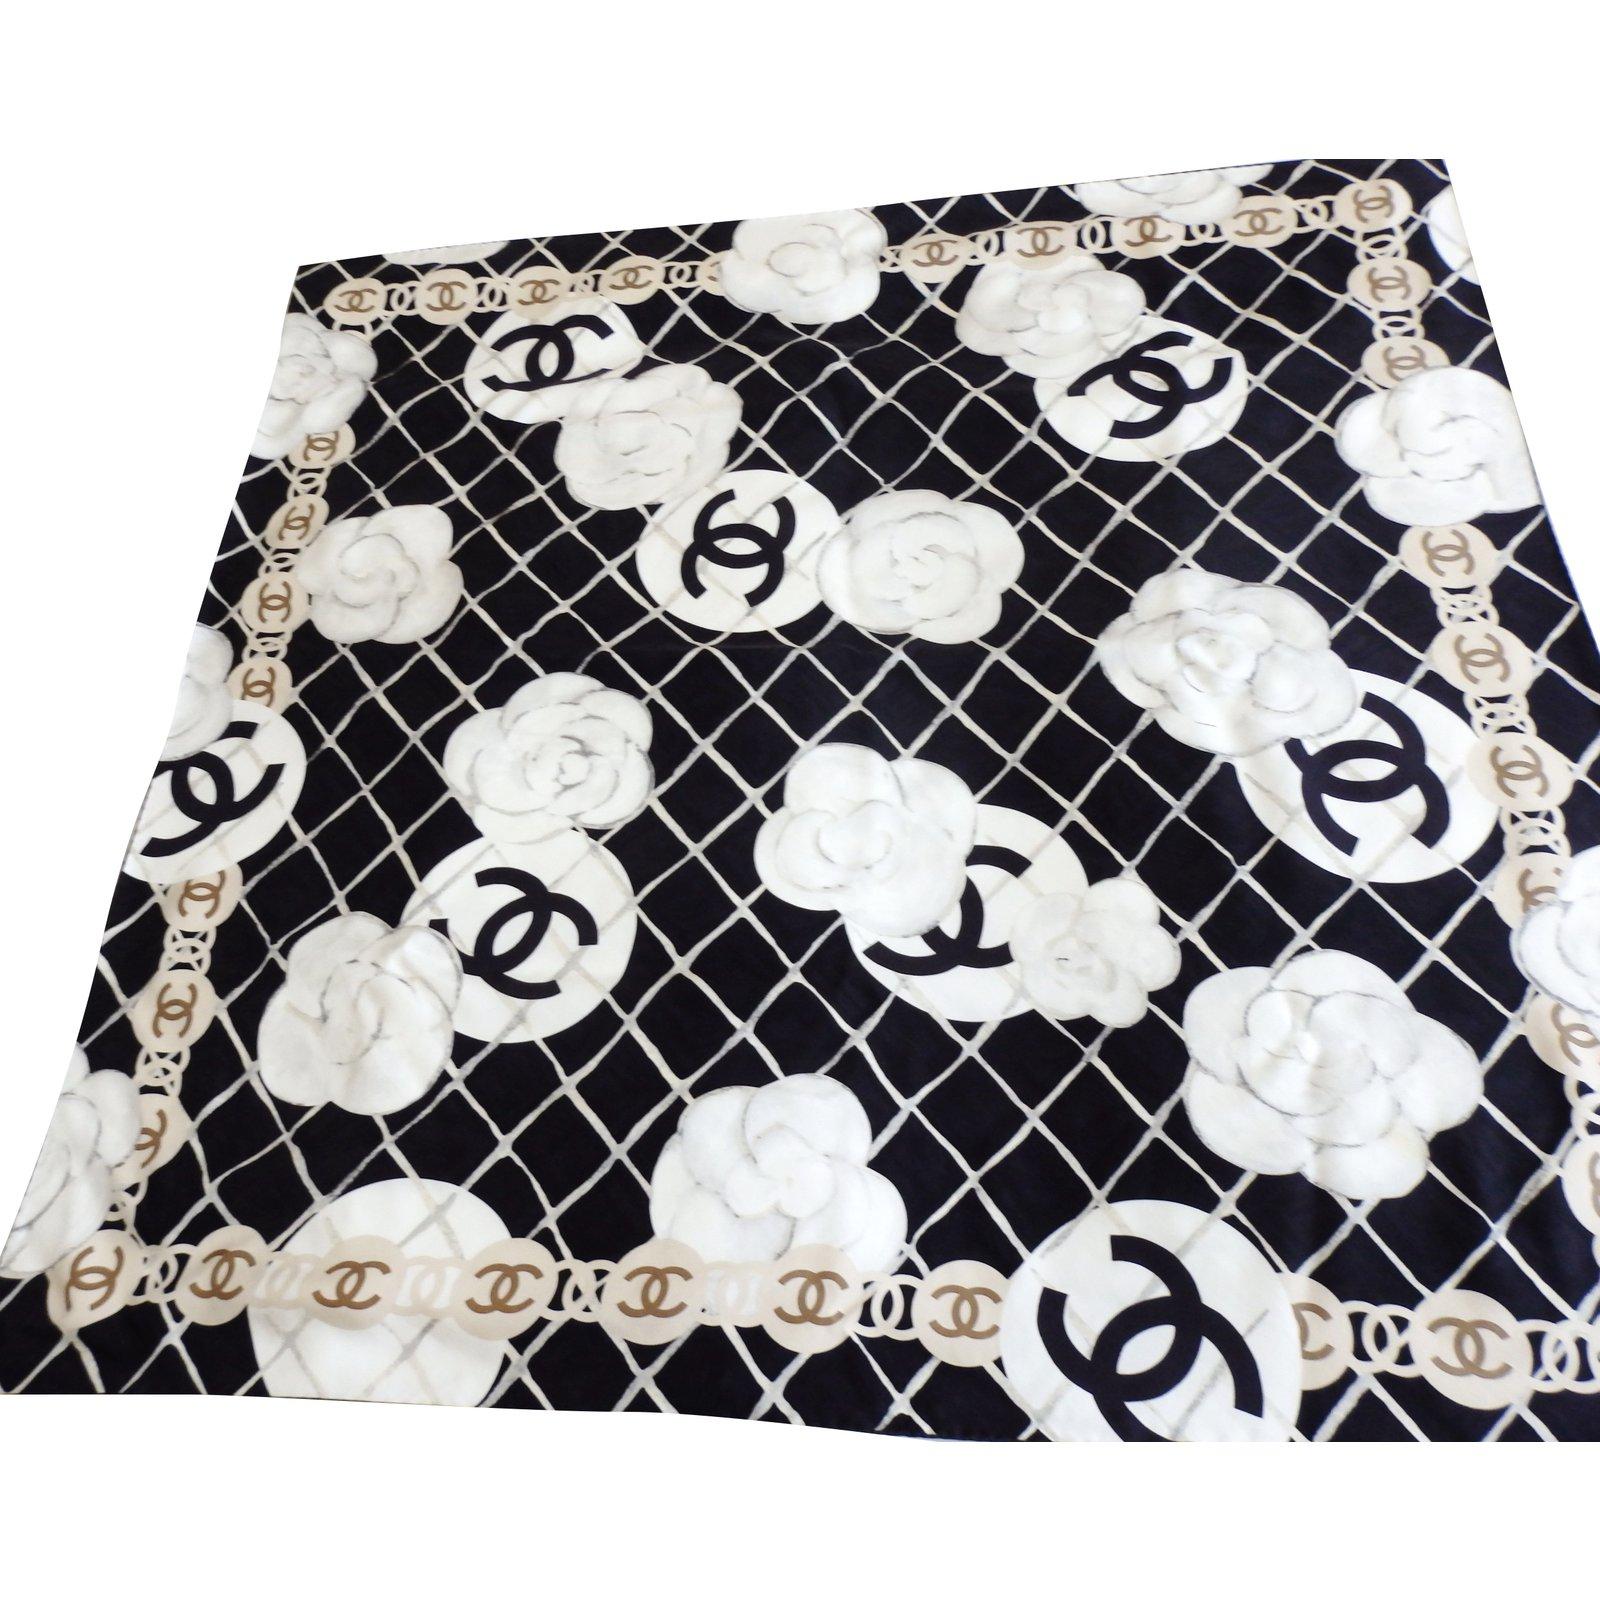 00d2d862259 Chanel Silk scarves Silk scarves Silk Black ref.65424 - Joli Closet